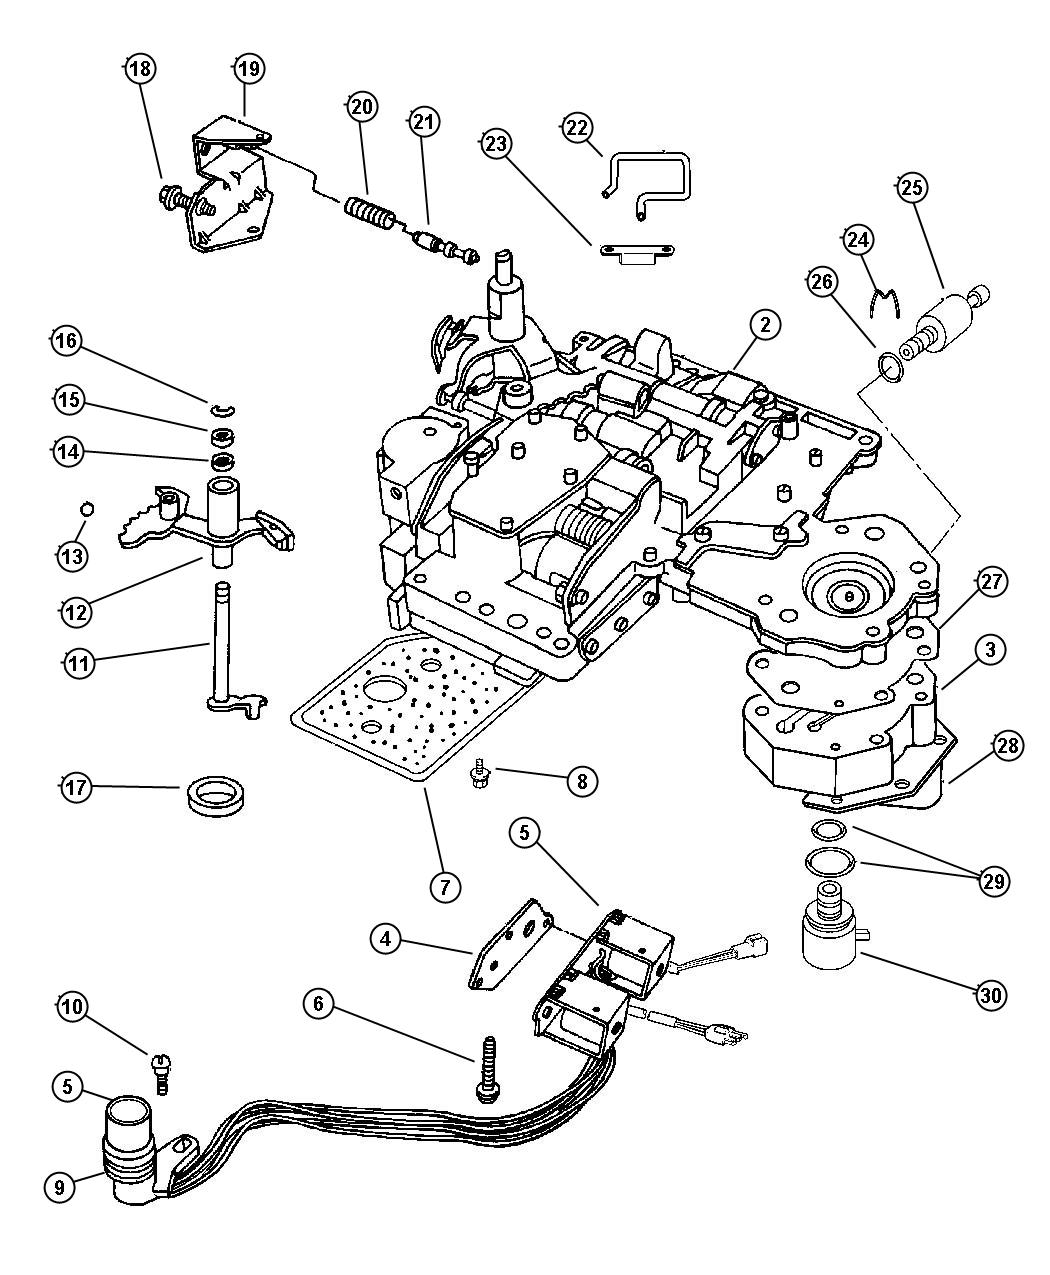 dodge 46re transmission wiring diagram